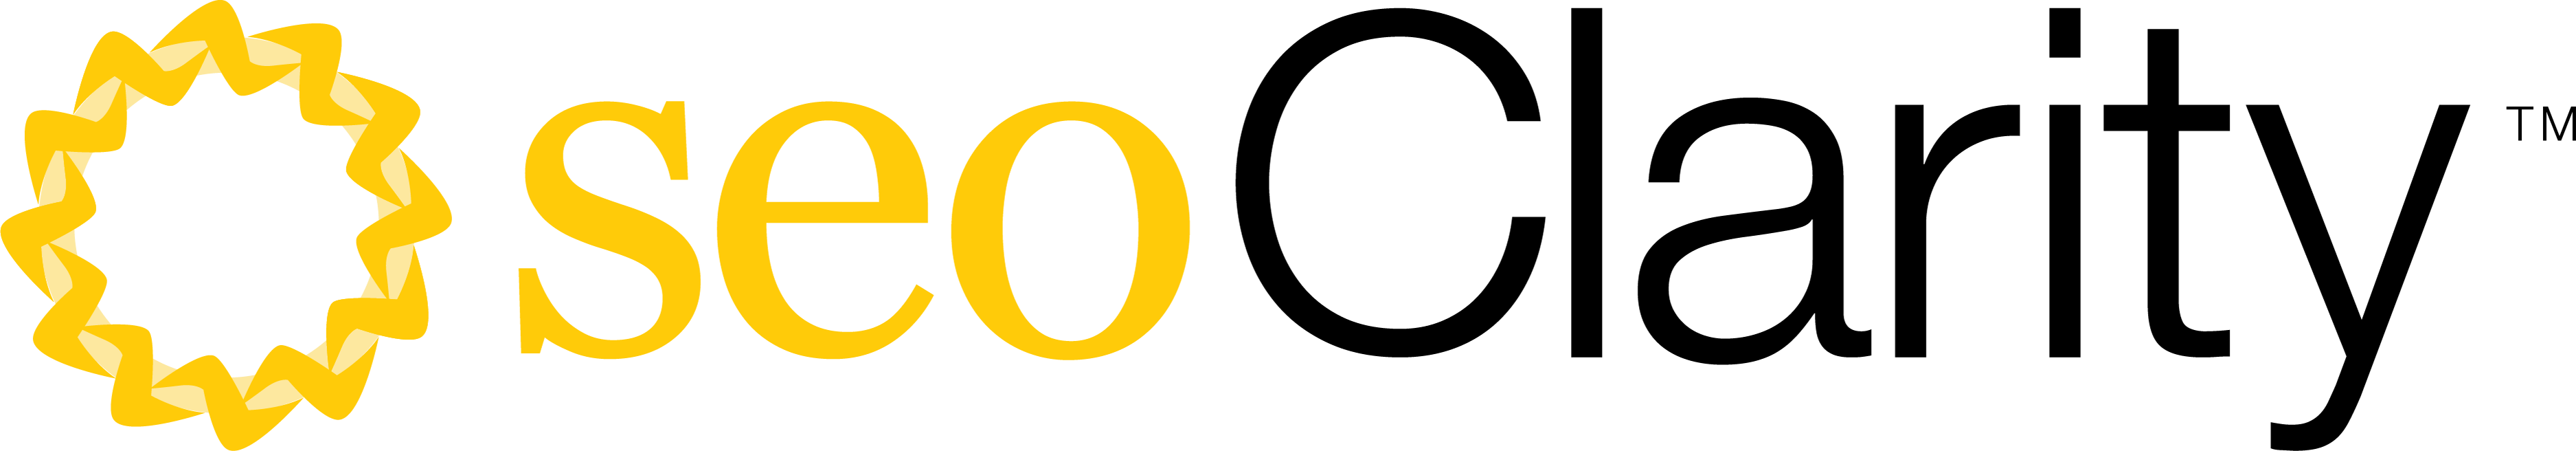 seoClarity logo